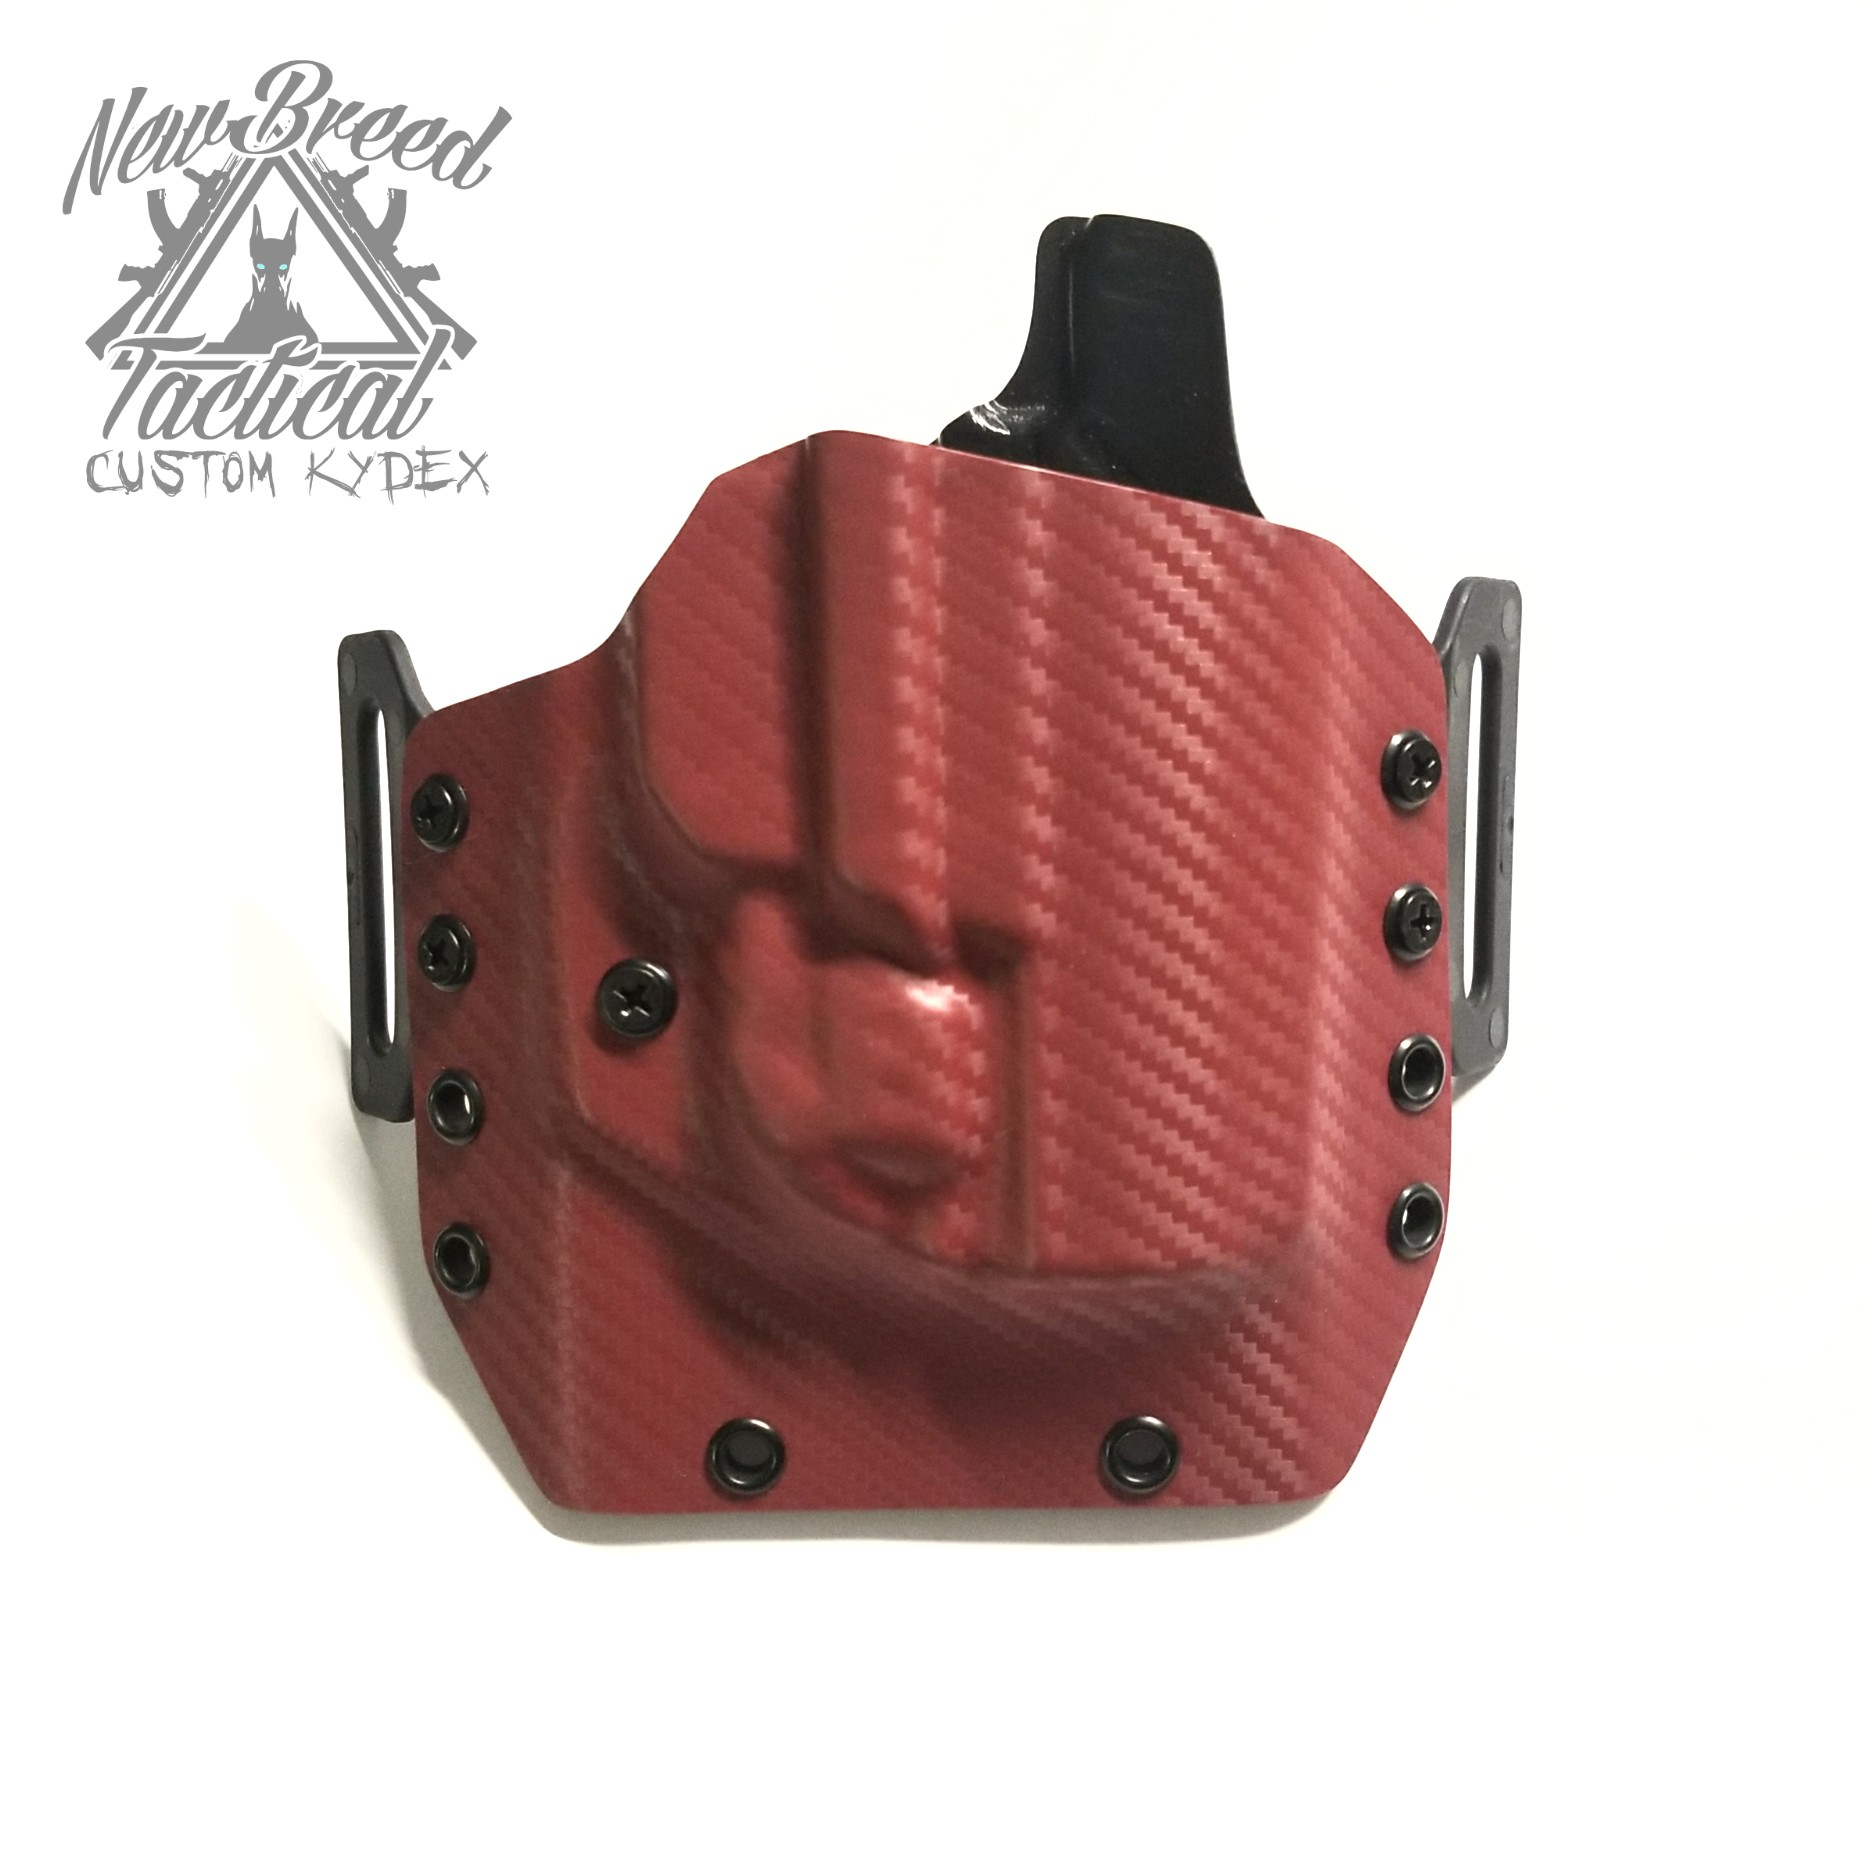 Watchdog Lightbearing OWB Holster - New Breed Tactical LLC